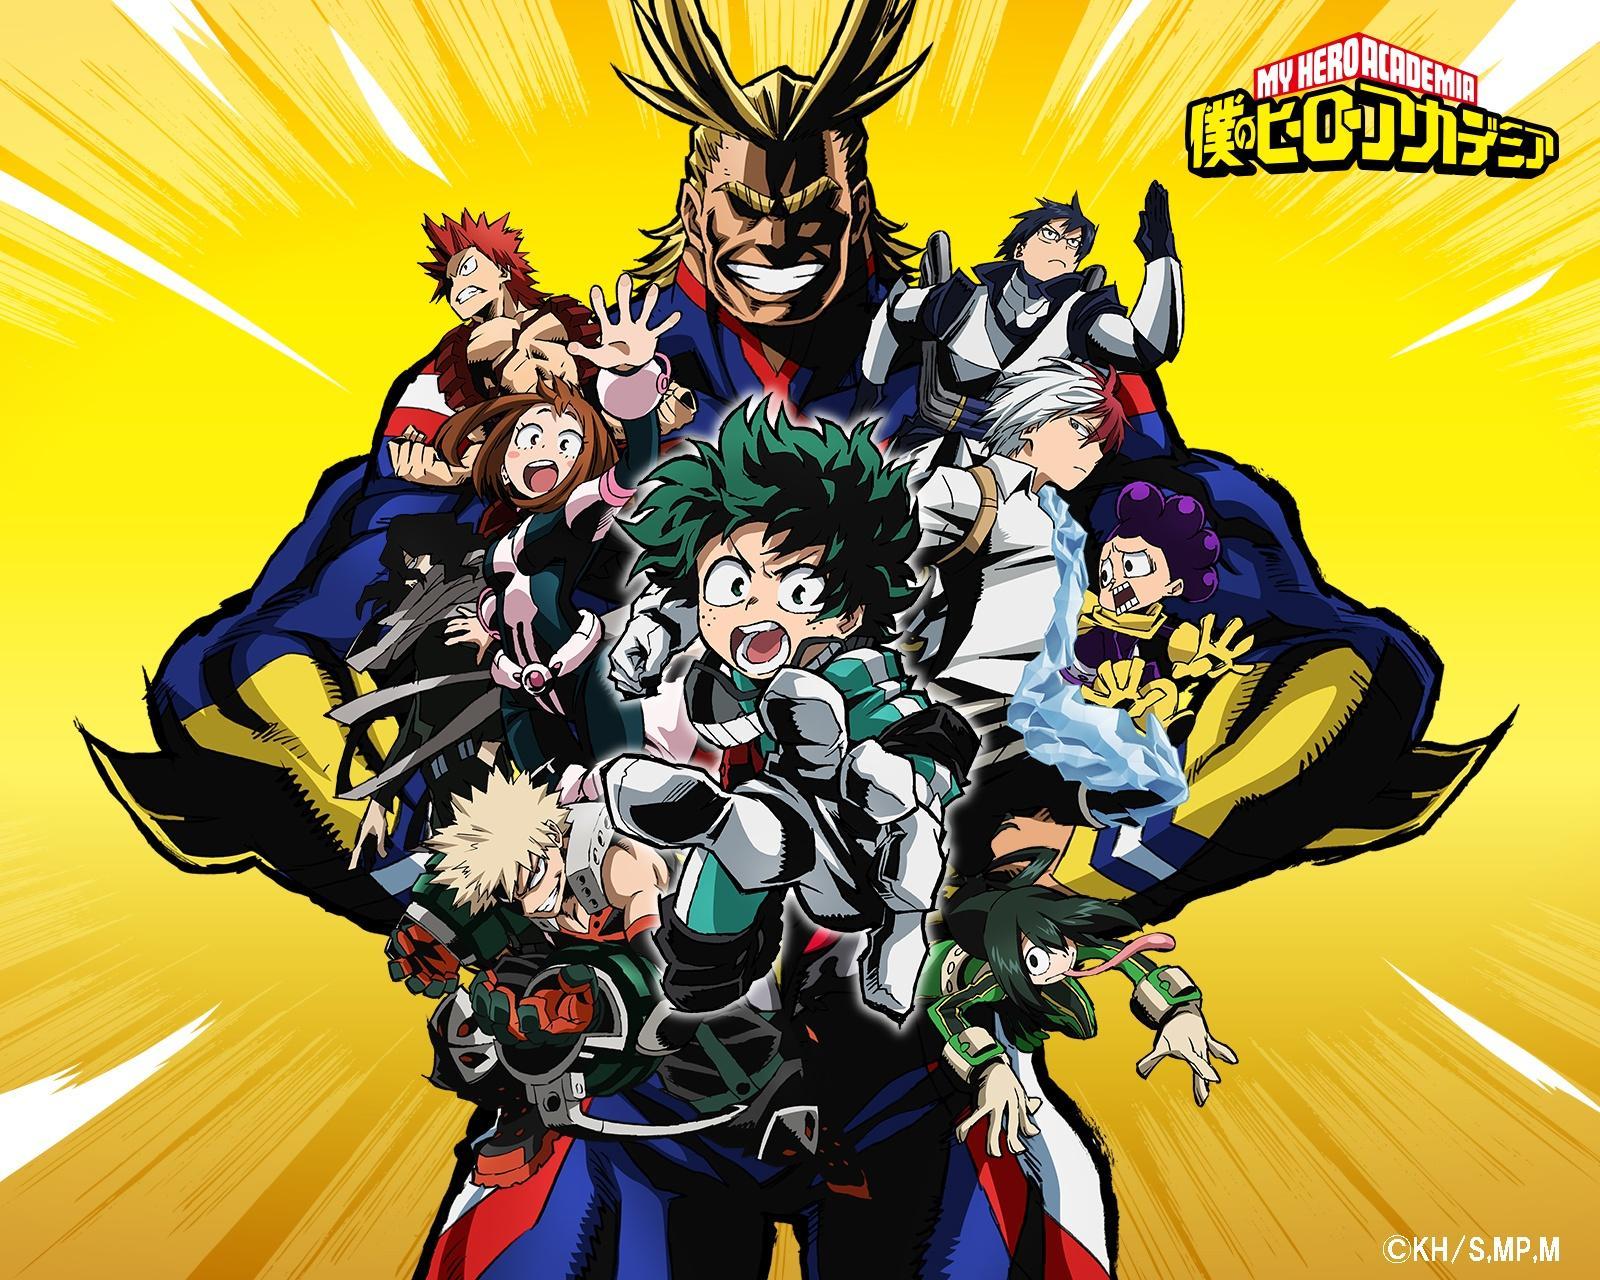 My Hero Academia - Anniversaires des personnages